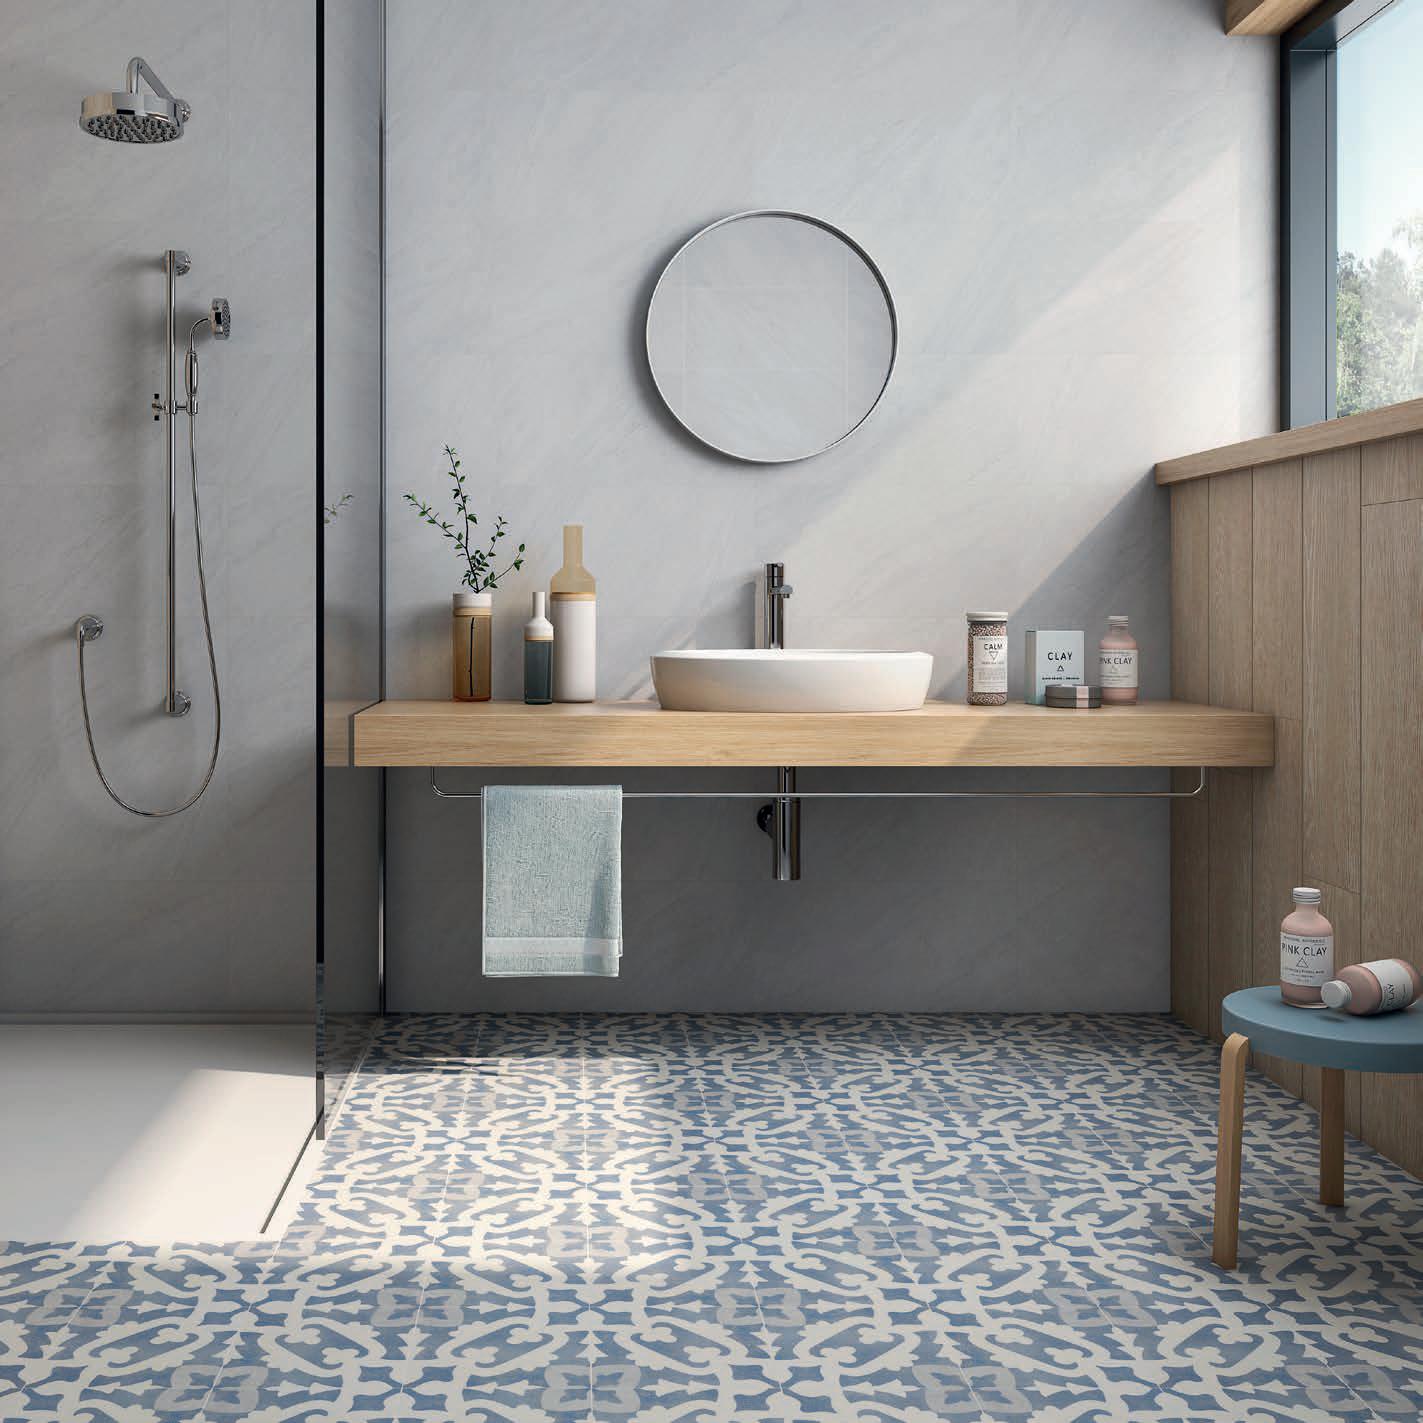 bathroom, grey wall, white shower floor, round mirror, wooden floating vanity, white sink, blue patterned floor, wooden wall